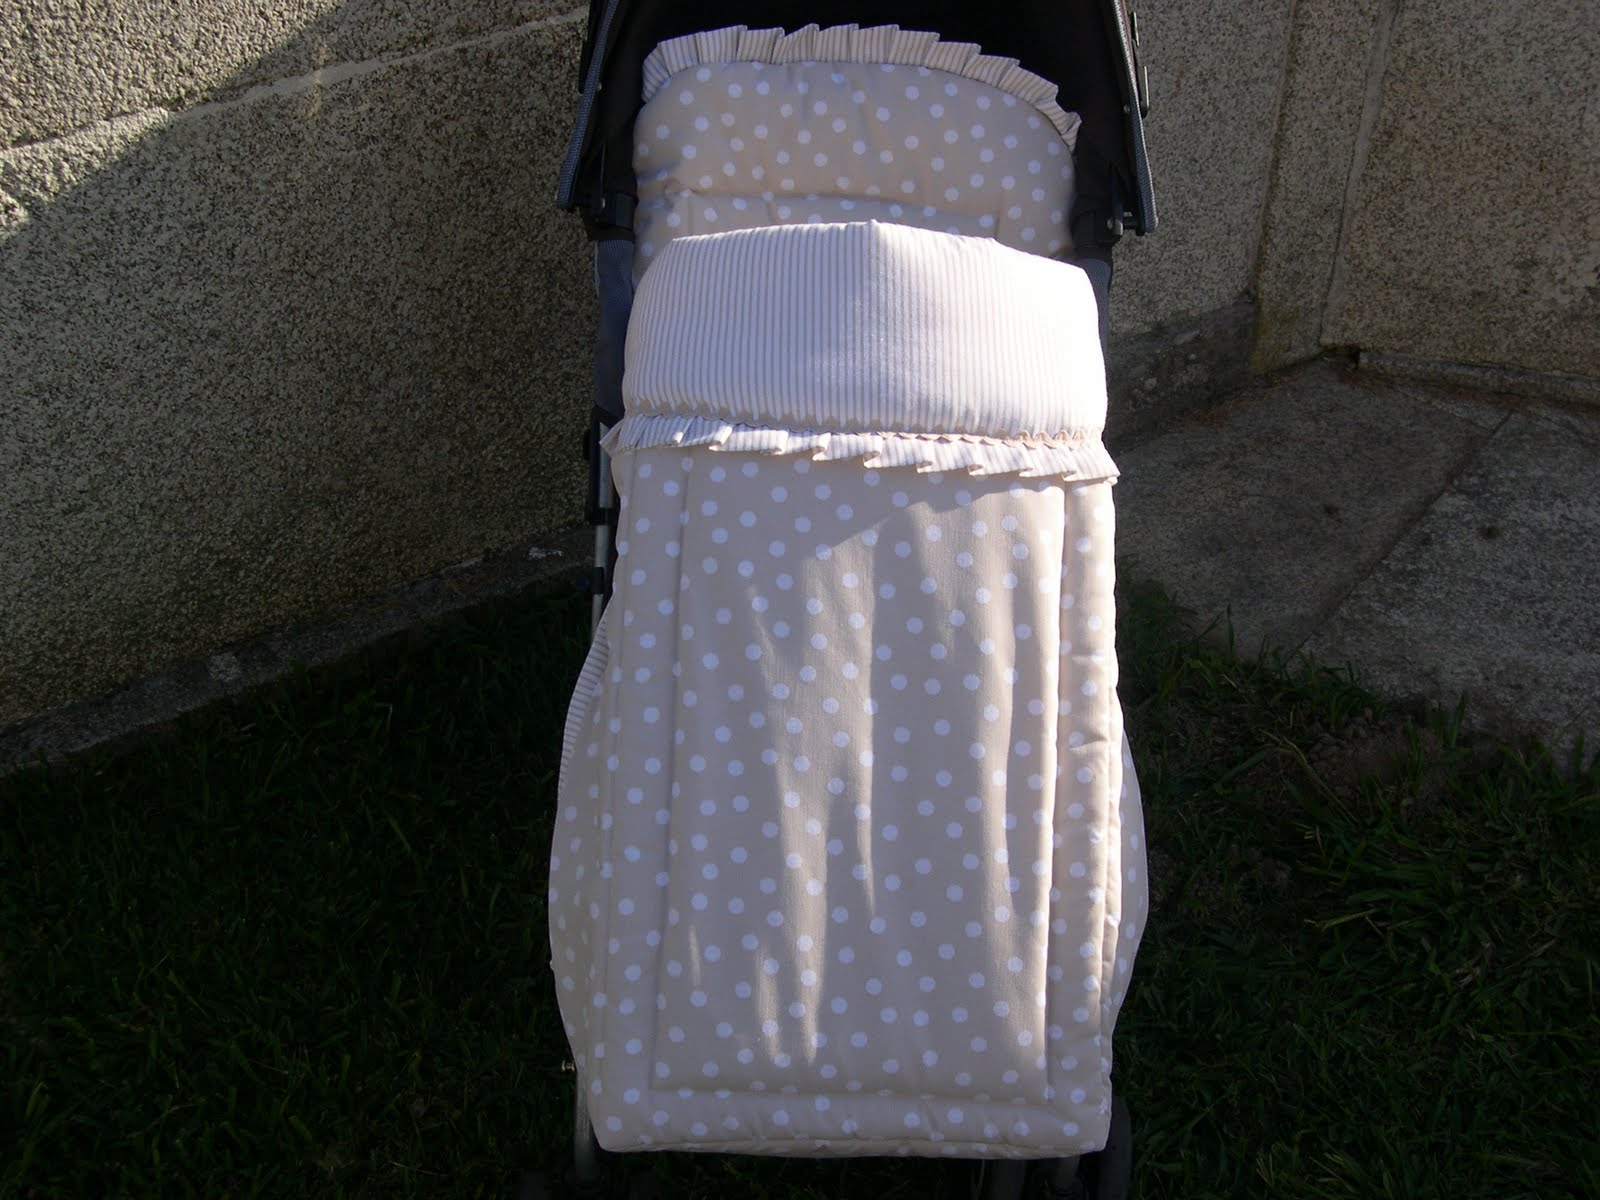 Bordaym s complementos infantiles sacos personalizados for Saco invierno maclaren